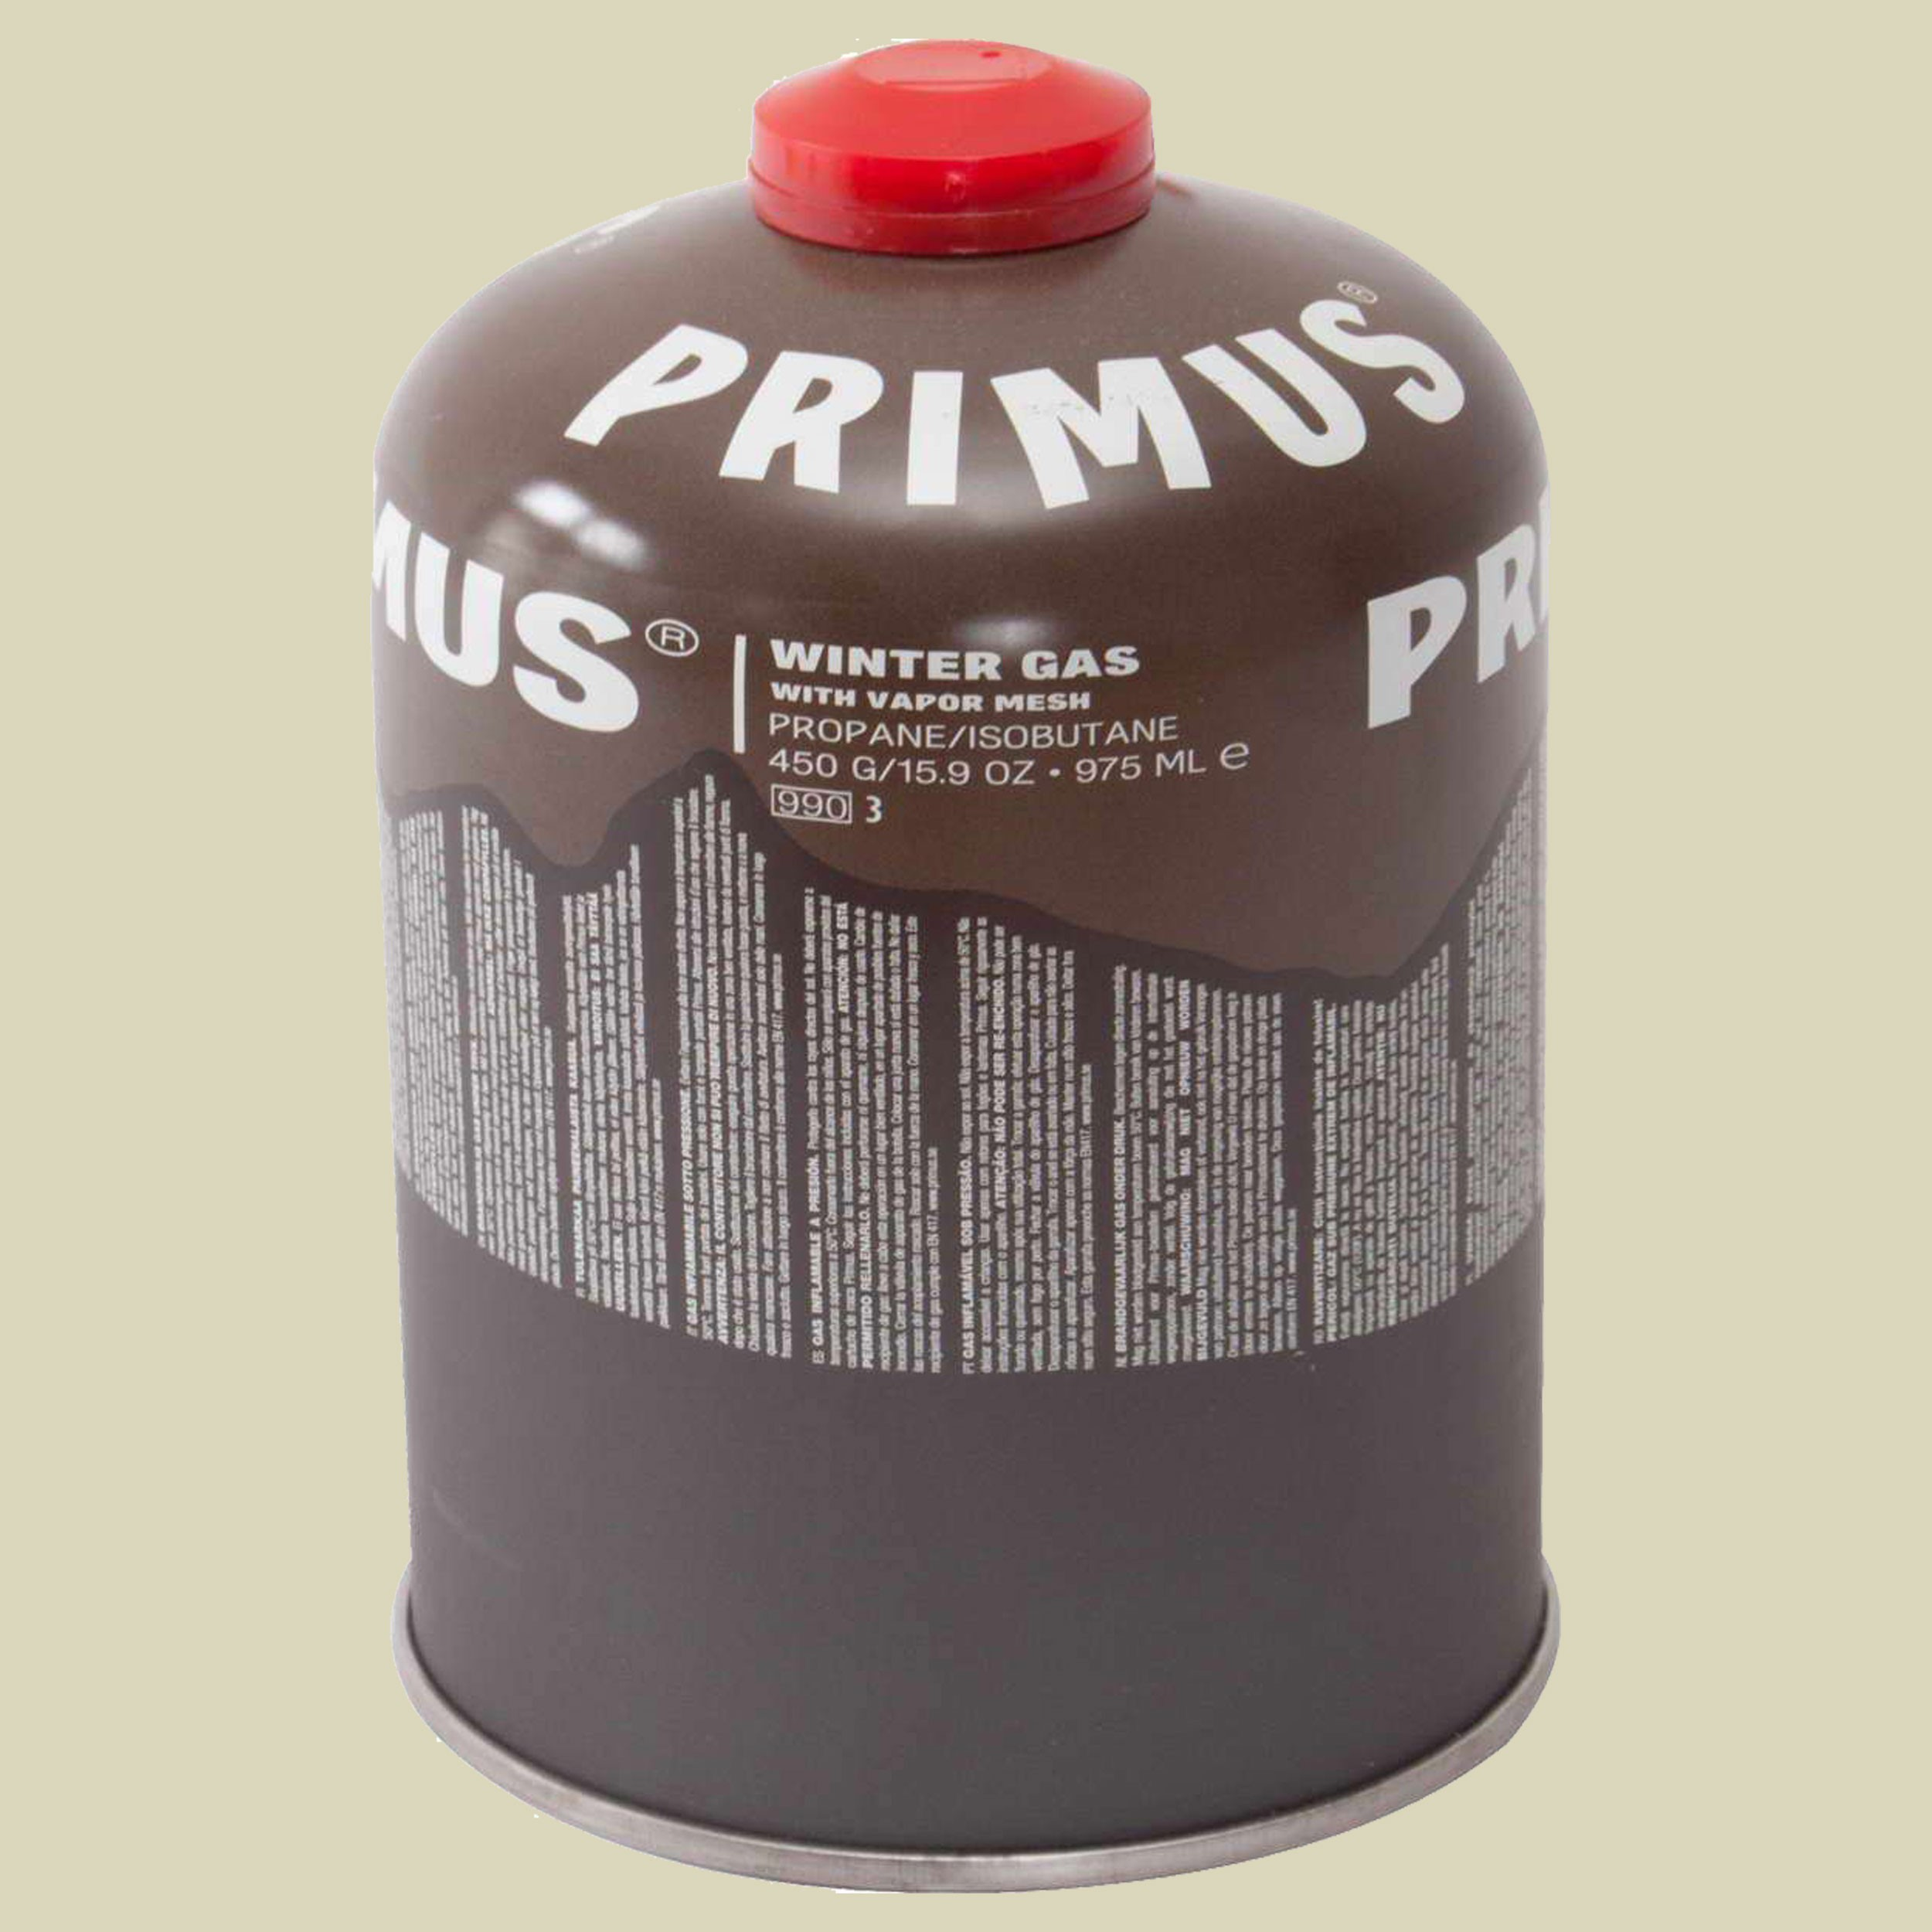 primus_winter_gas_gaskartusche_450_g_rl_220271_fallback